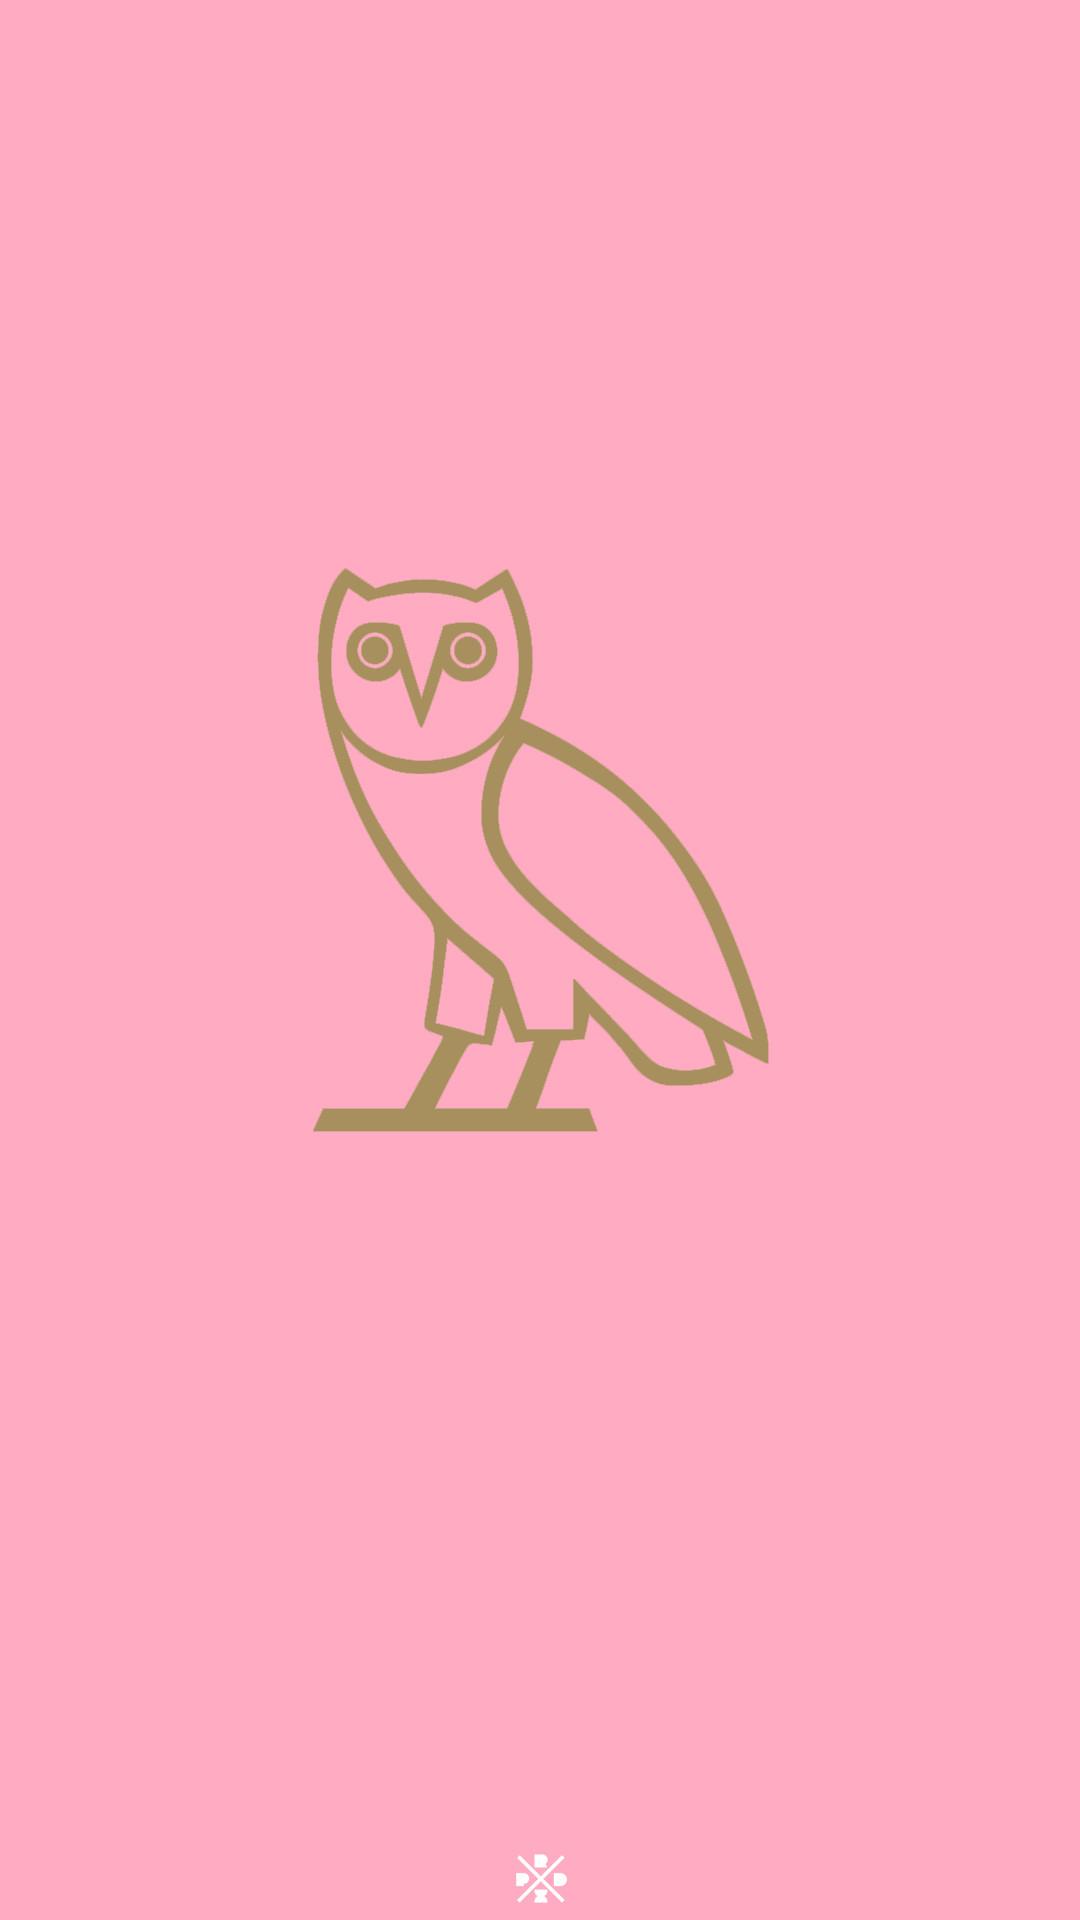 2560x1600 BWallpapers Ovo Drake Owl B 2 1280x960